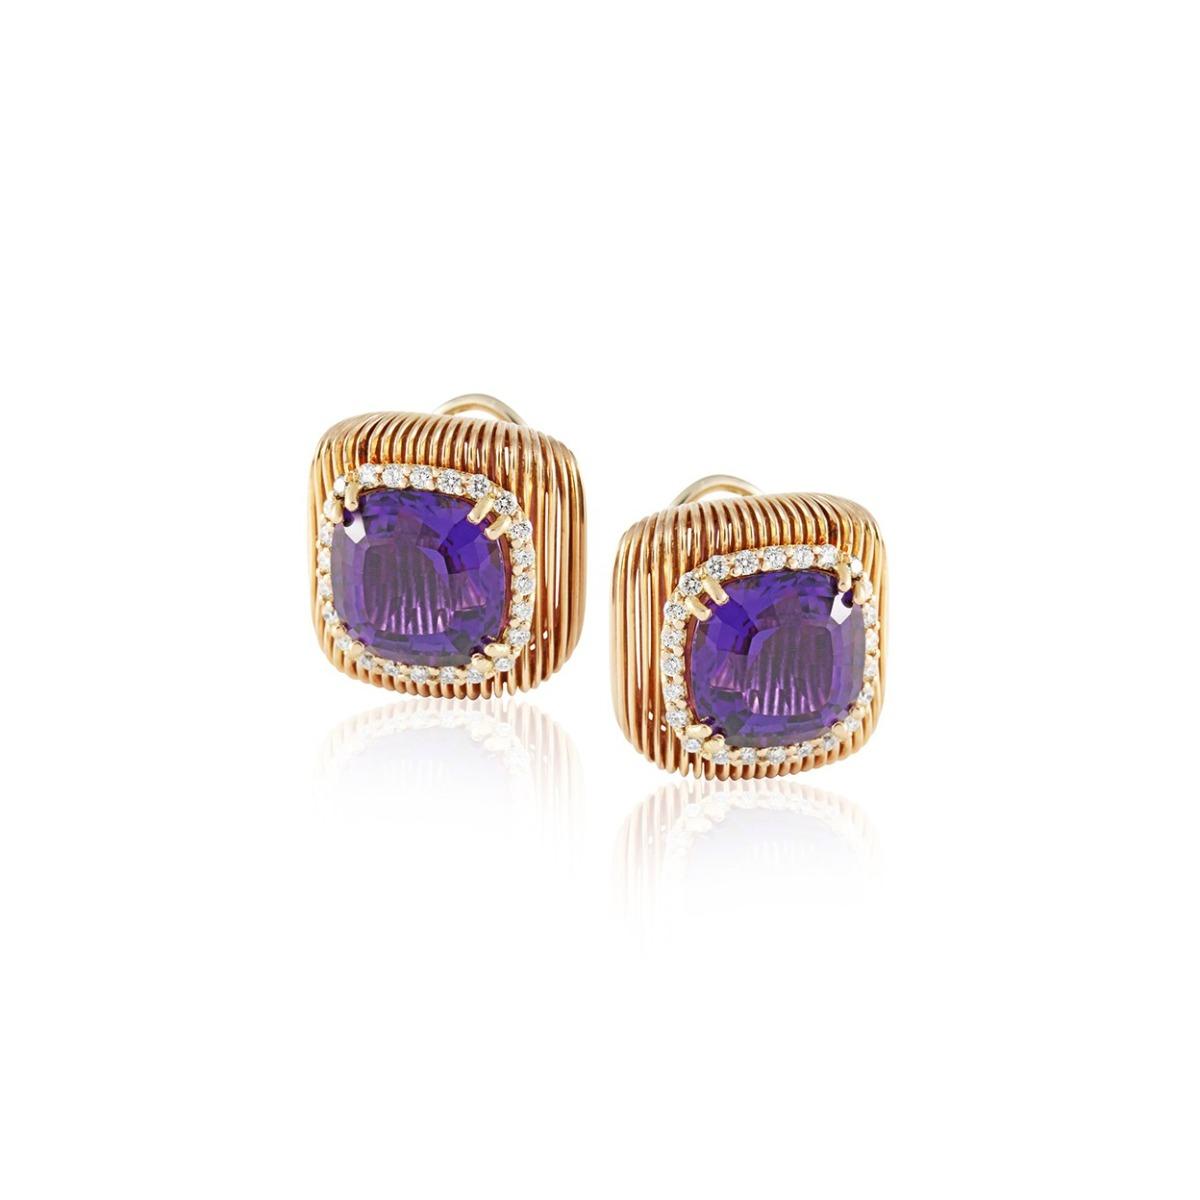 Batumi Rose Gold and Purple Amethyst Stud Earrings